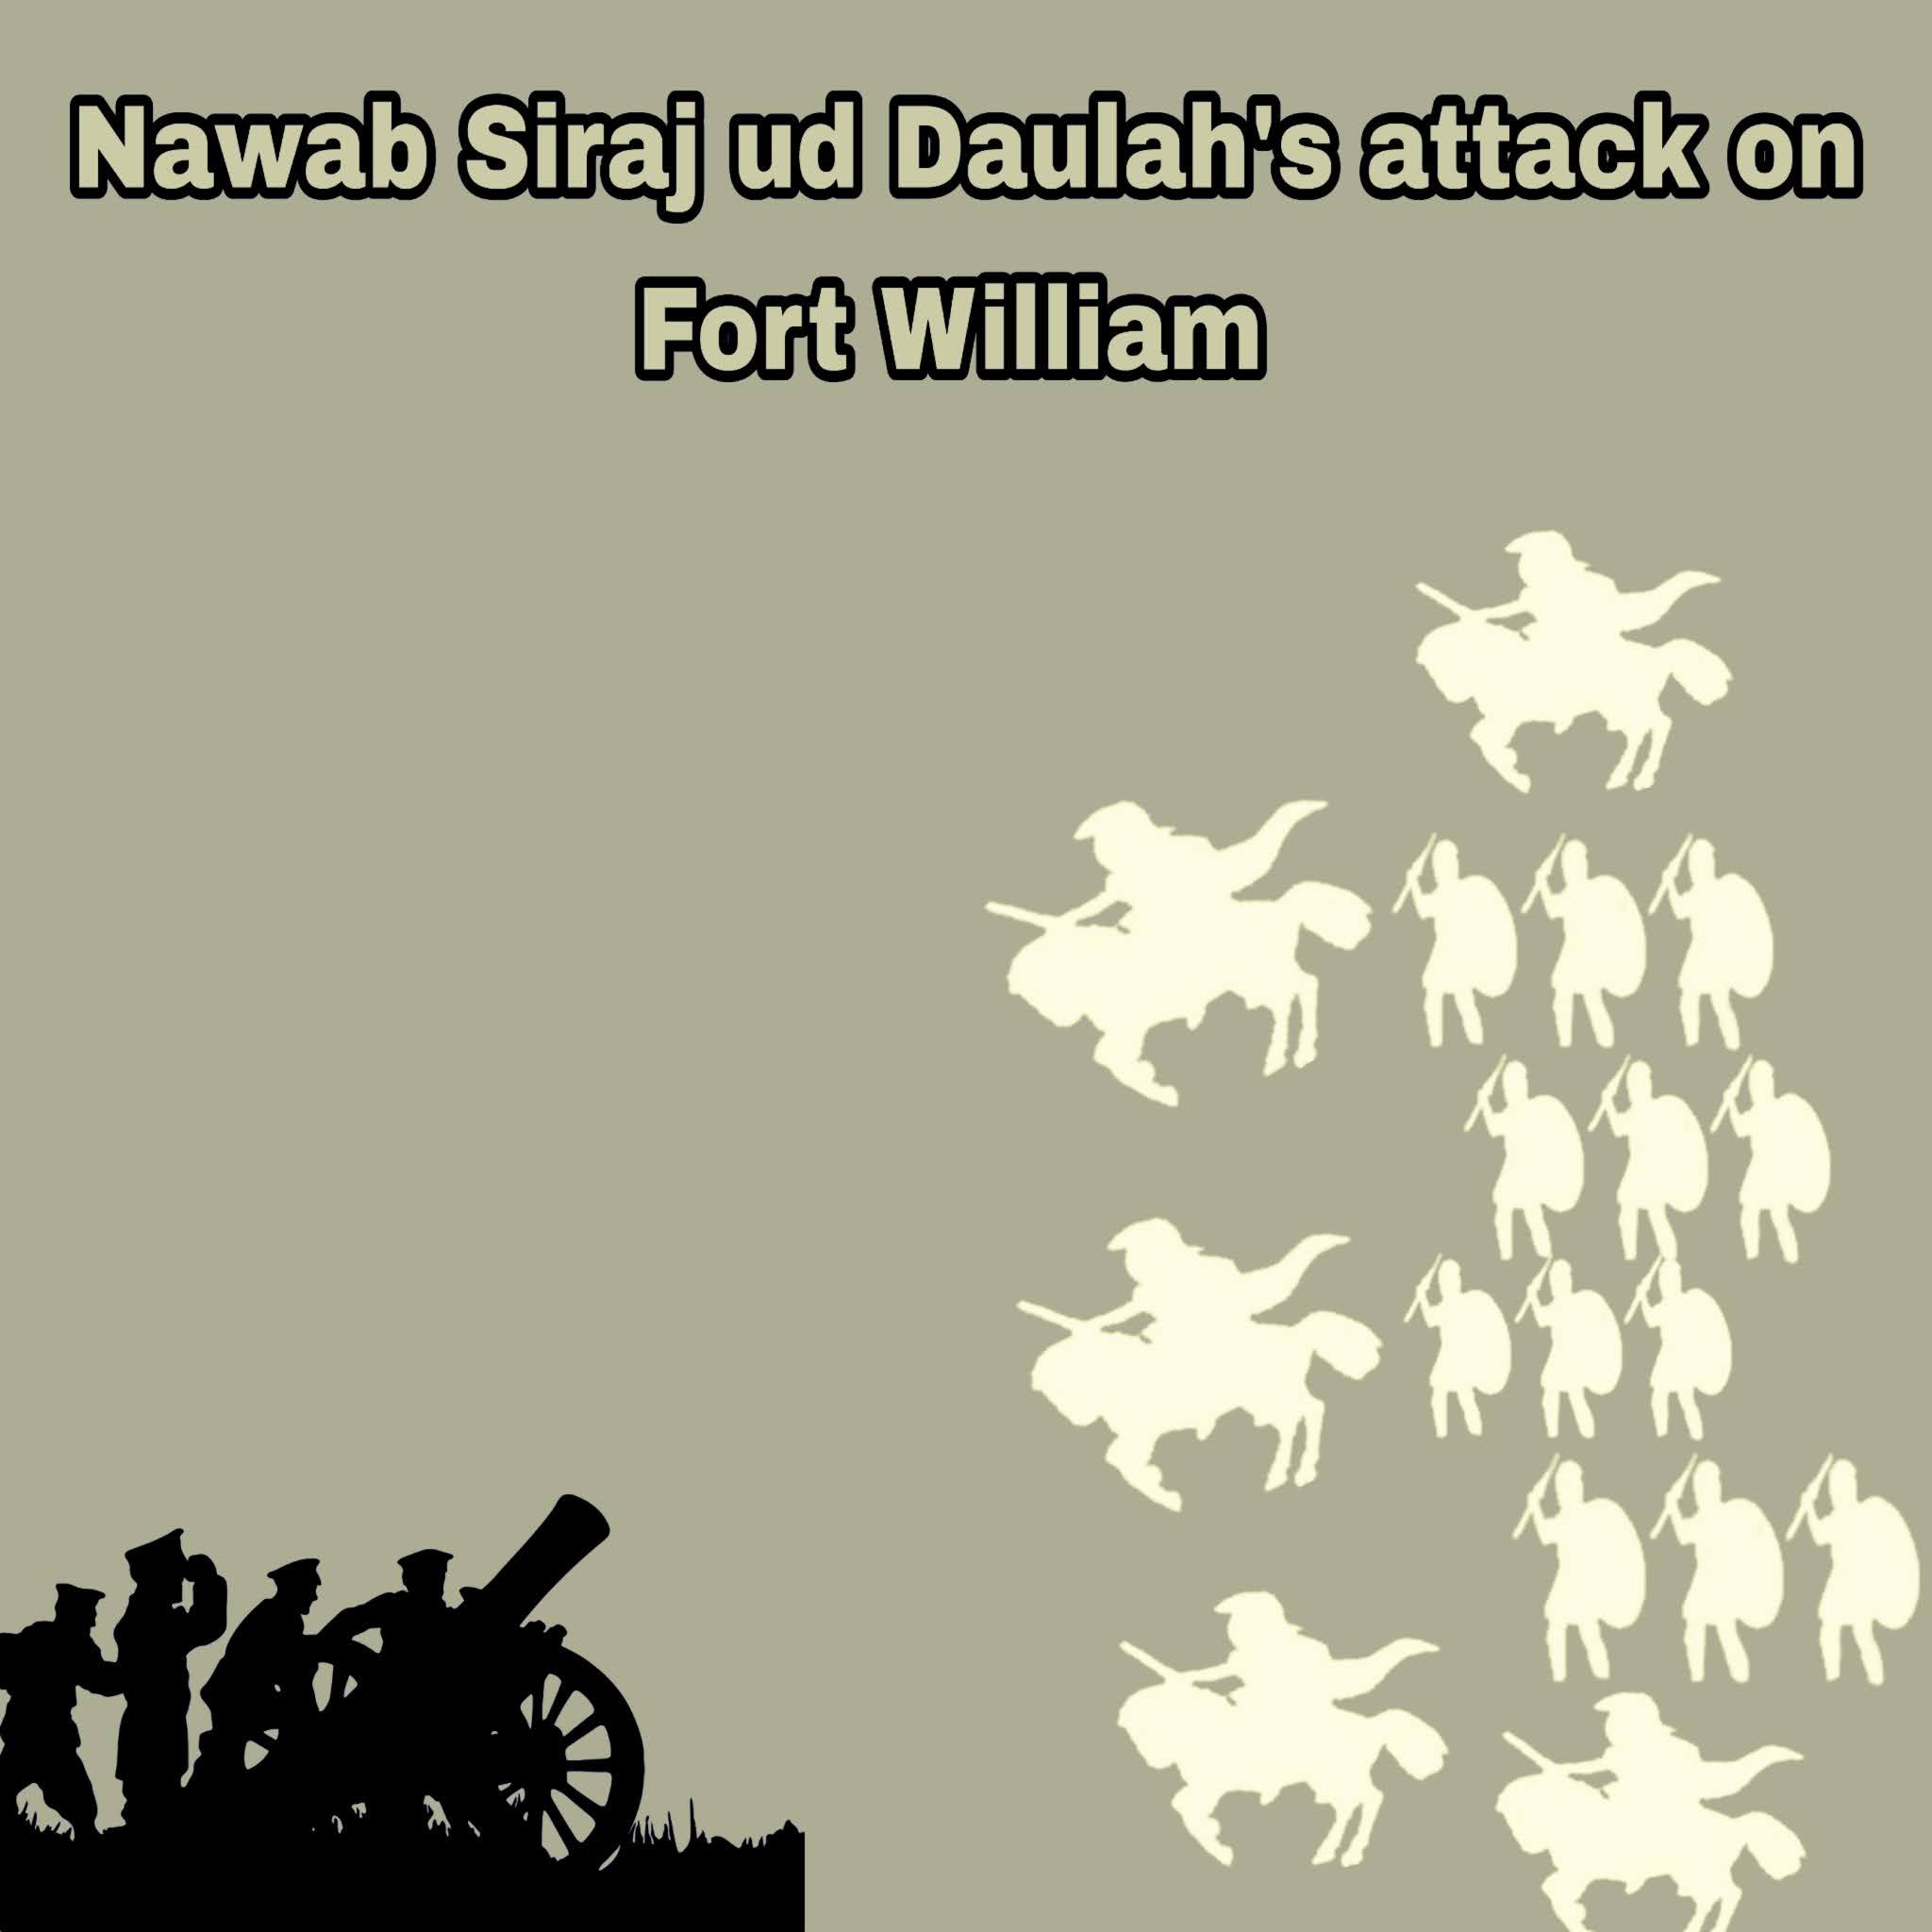 Nawab Siraj ud Daulah's attack on Fort William